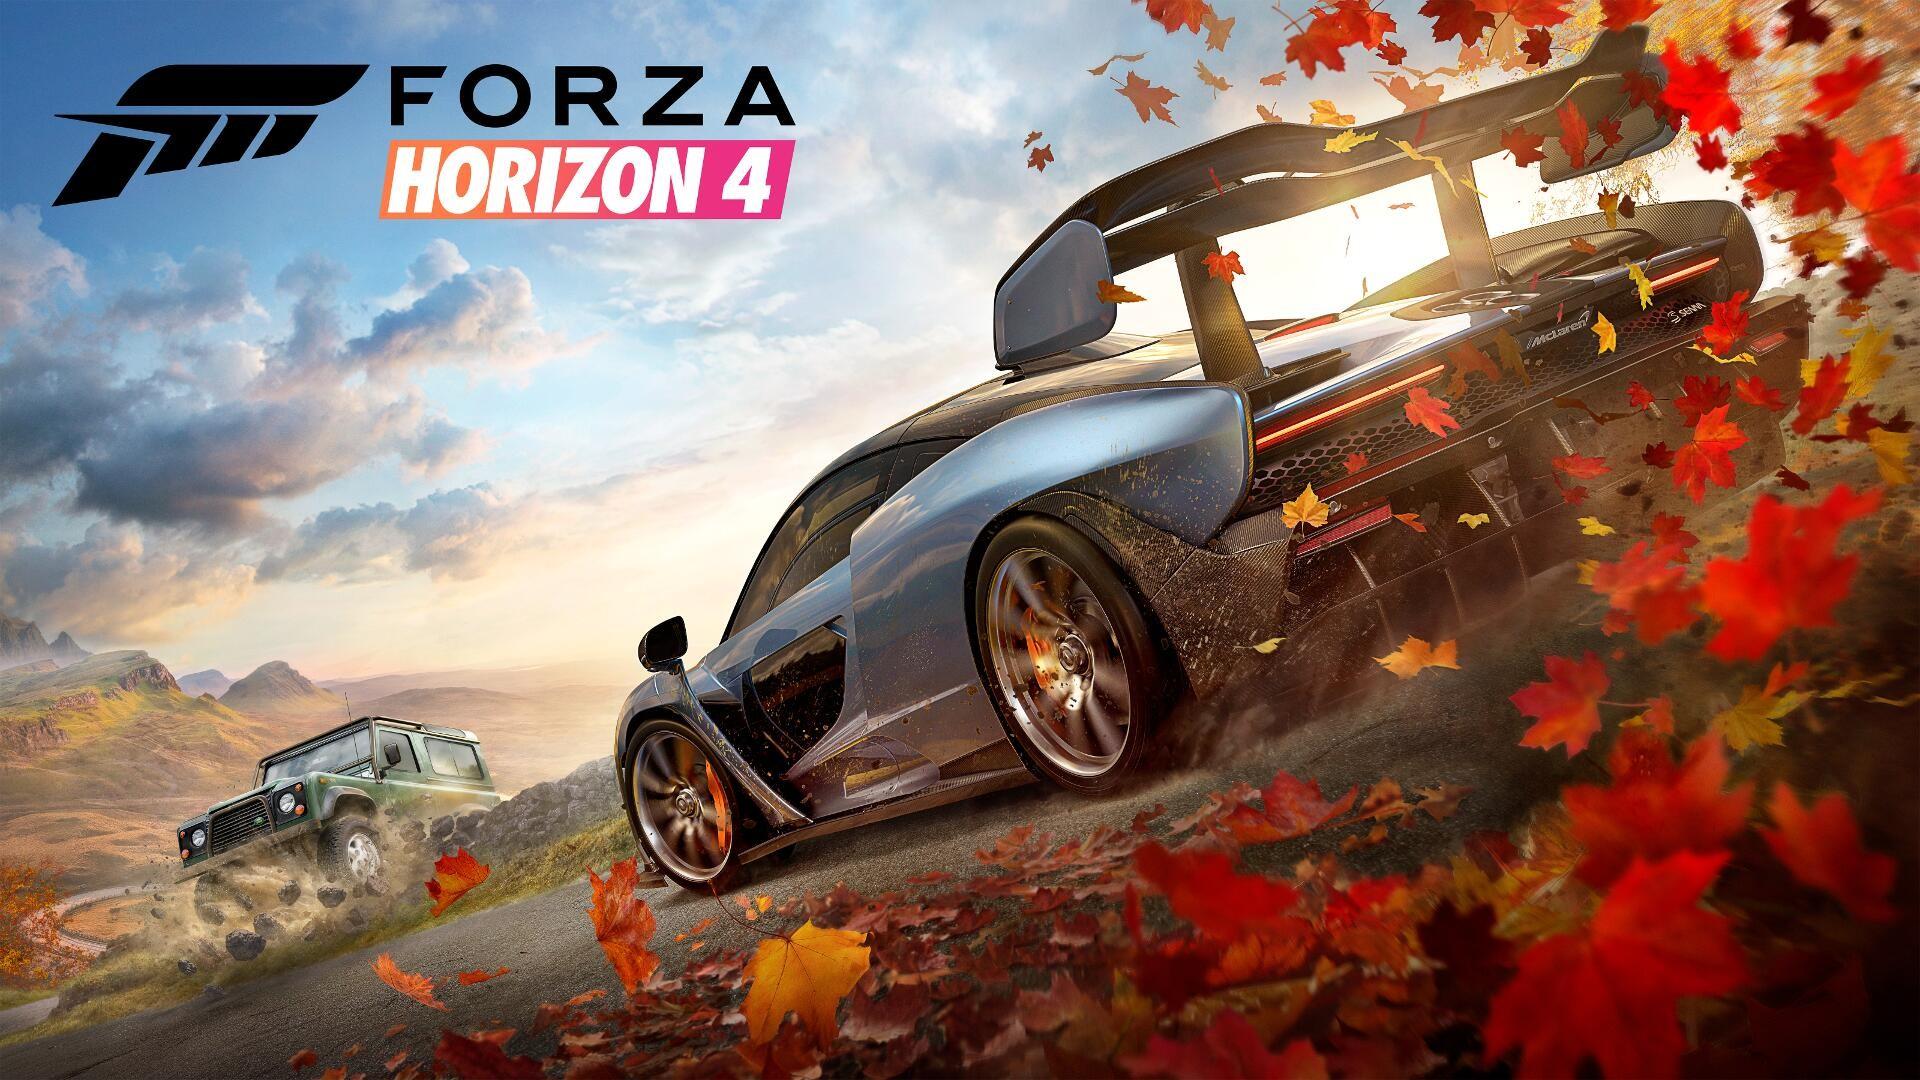 Jeu Vidéo Forza Horizon 4